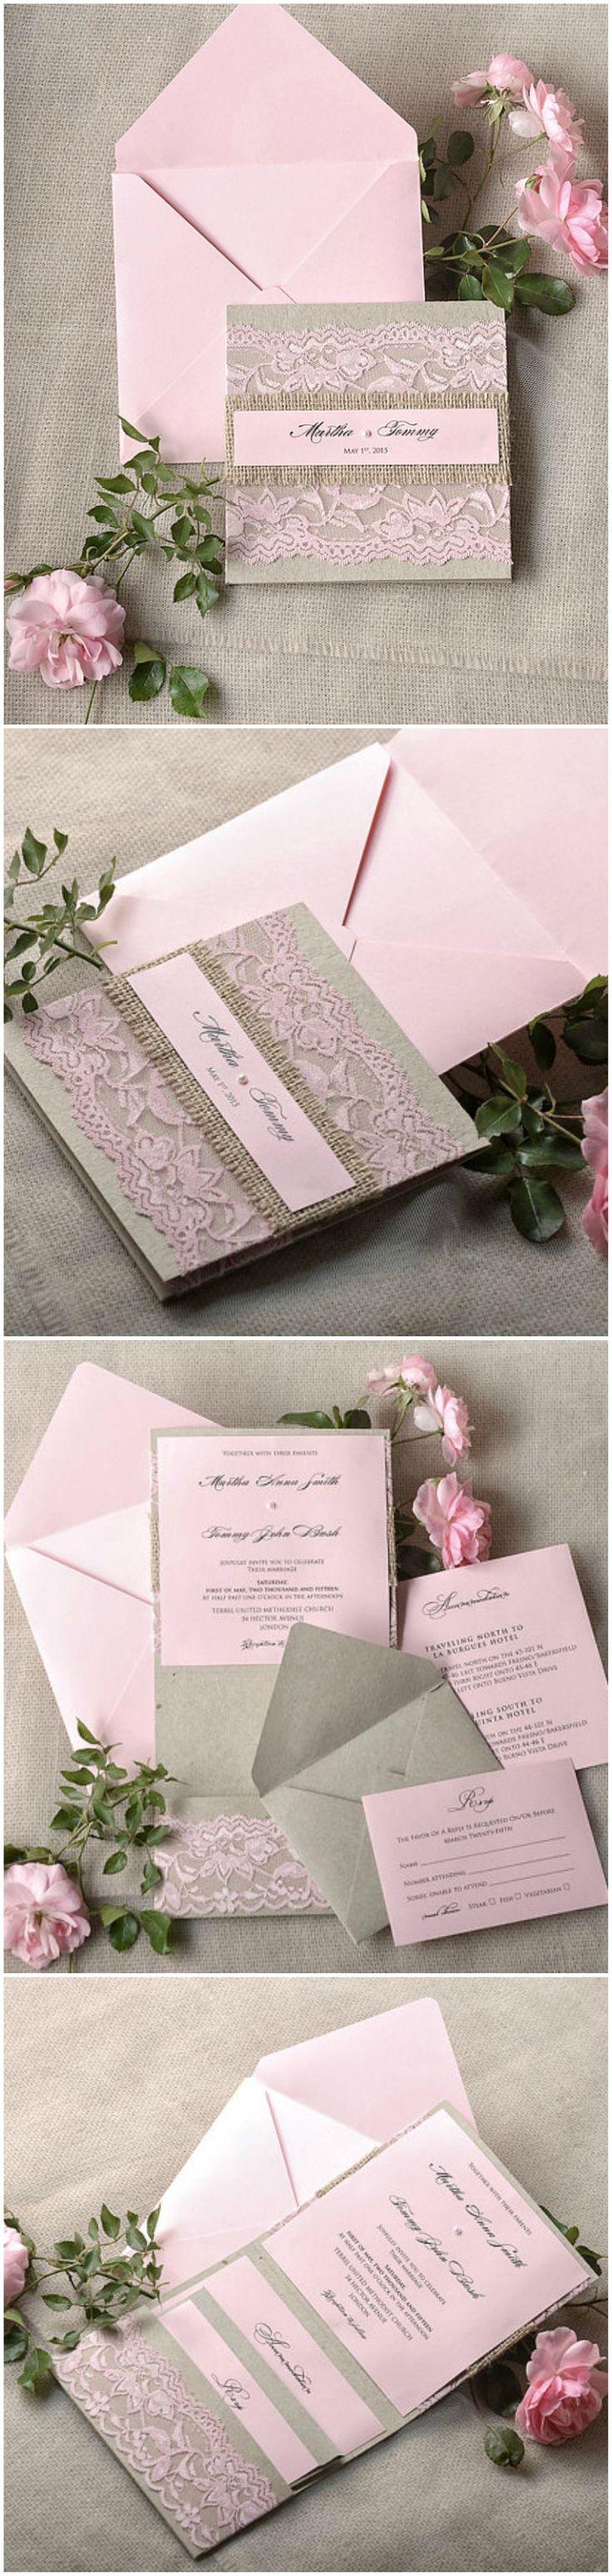 210 best wedding invitations images on pinterest diy wedding wedding invitations lace stopboris Images